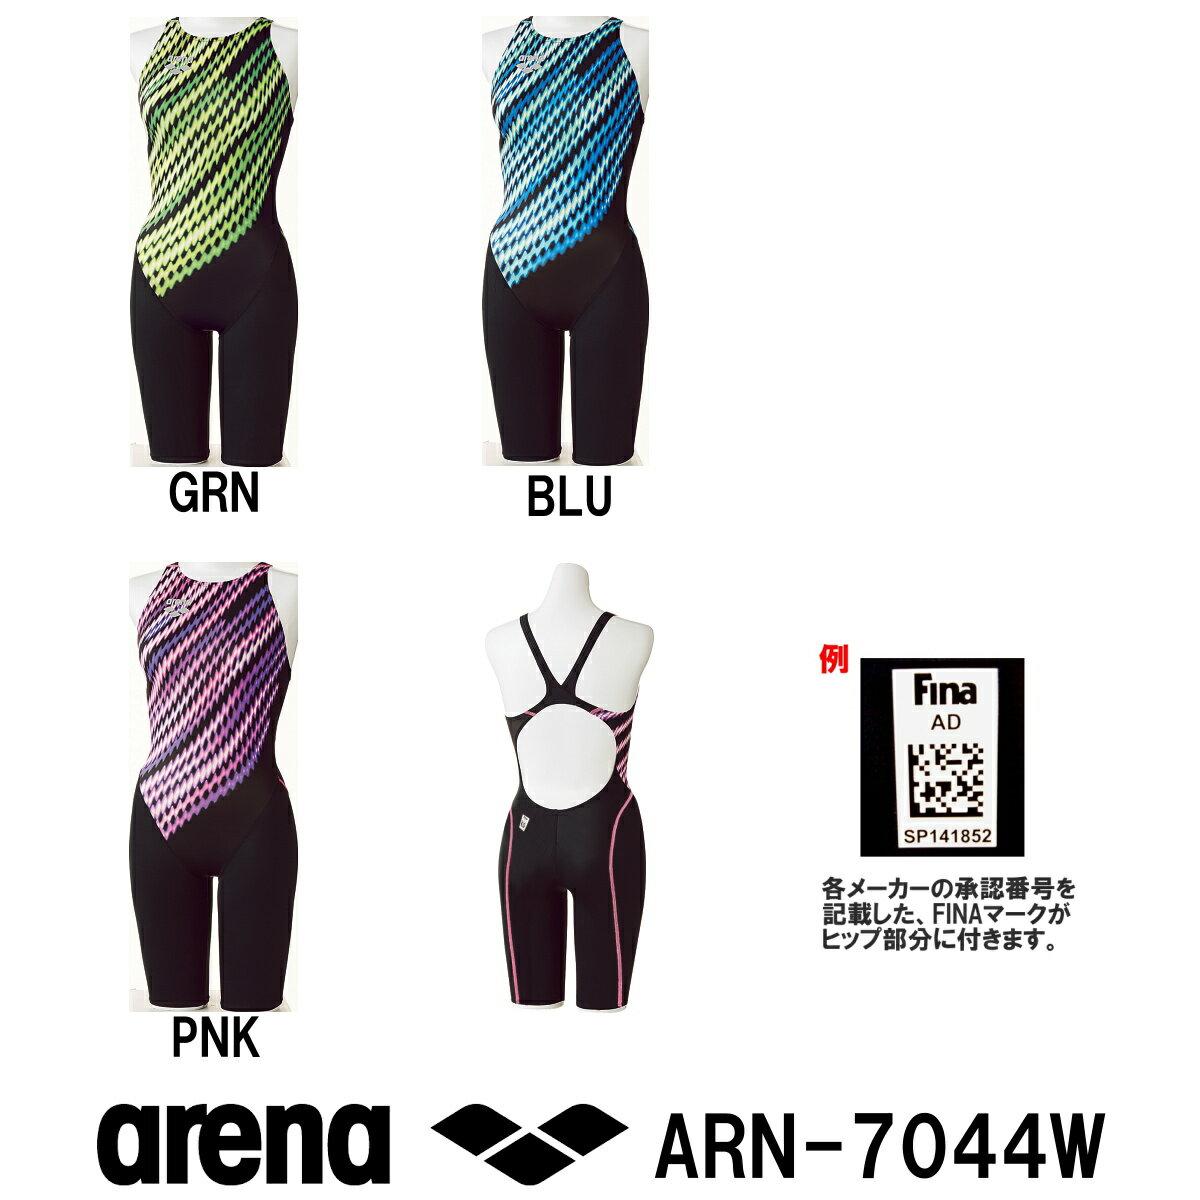 【ARN-7044W】ARENA(アリーナ)